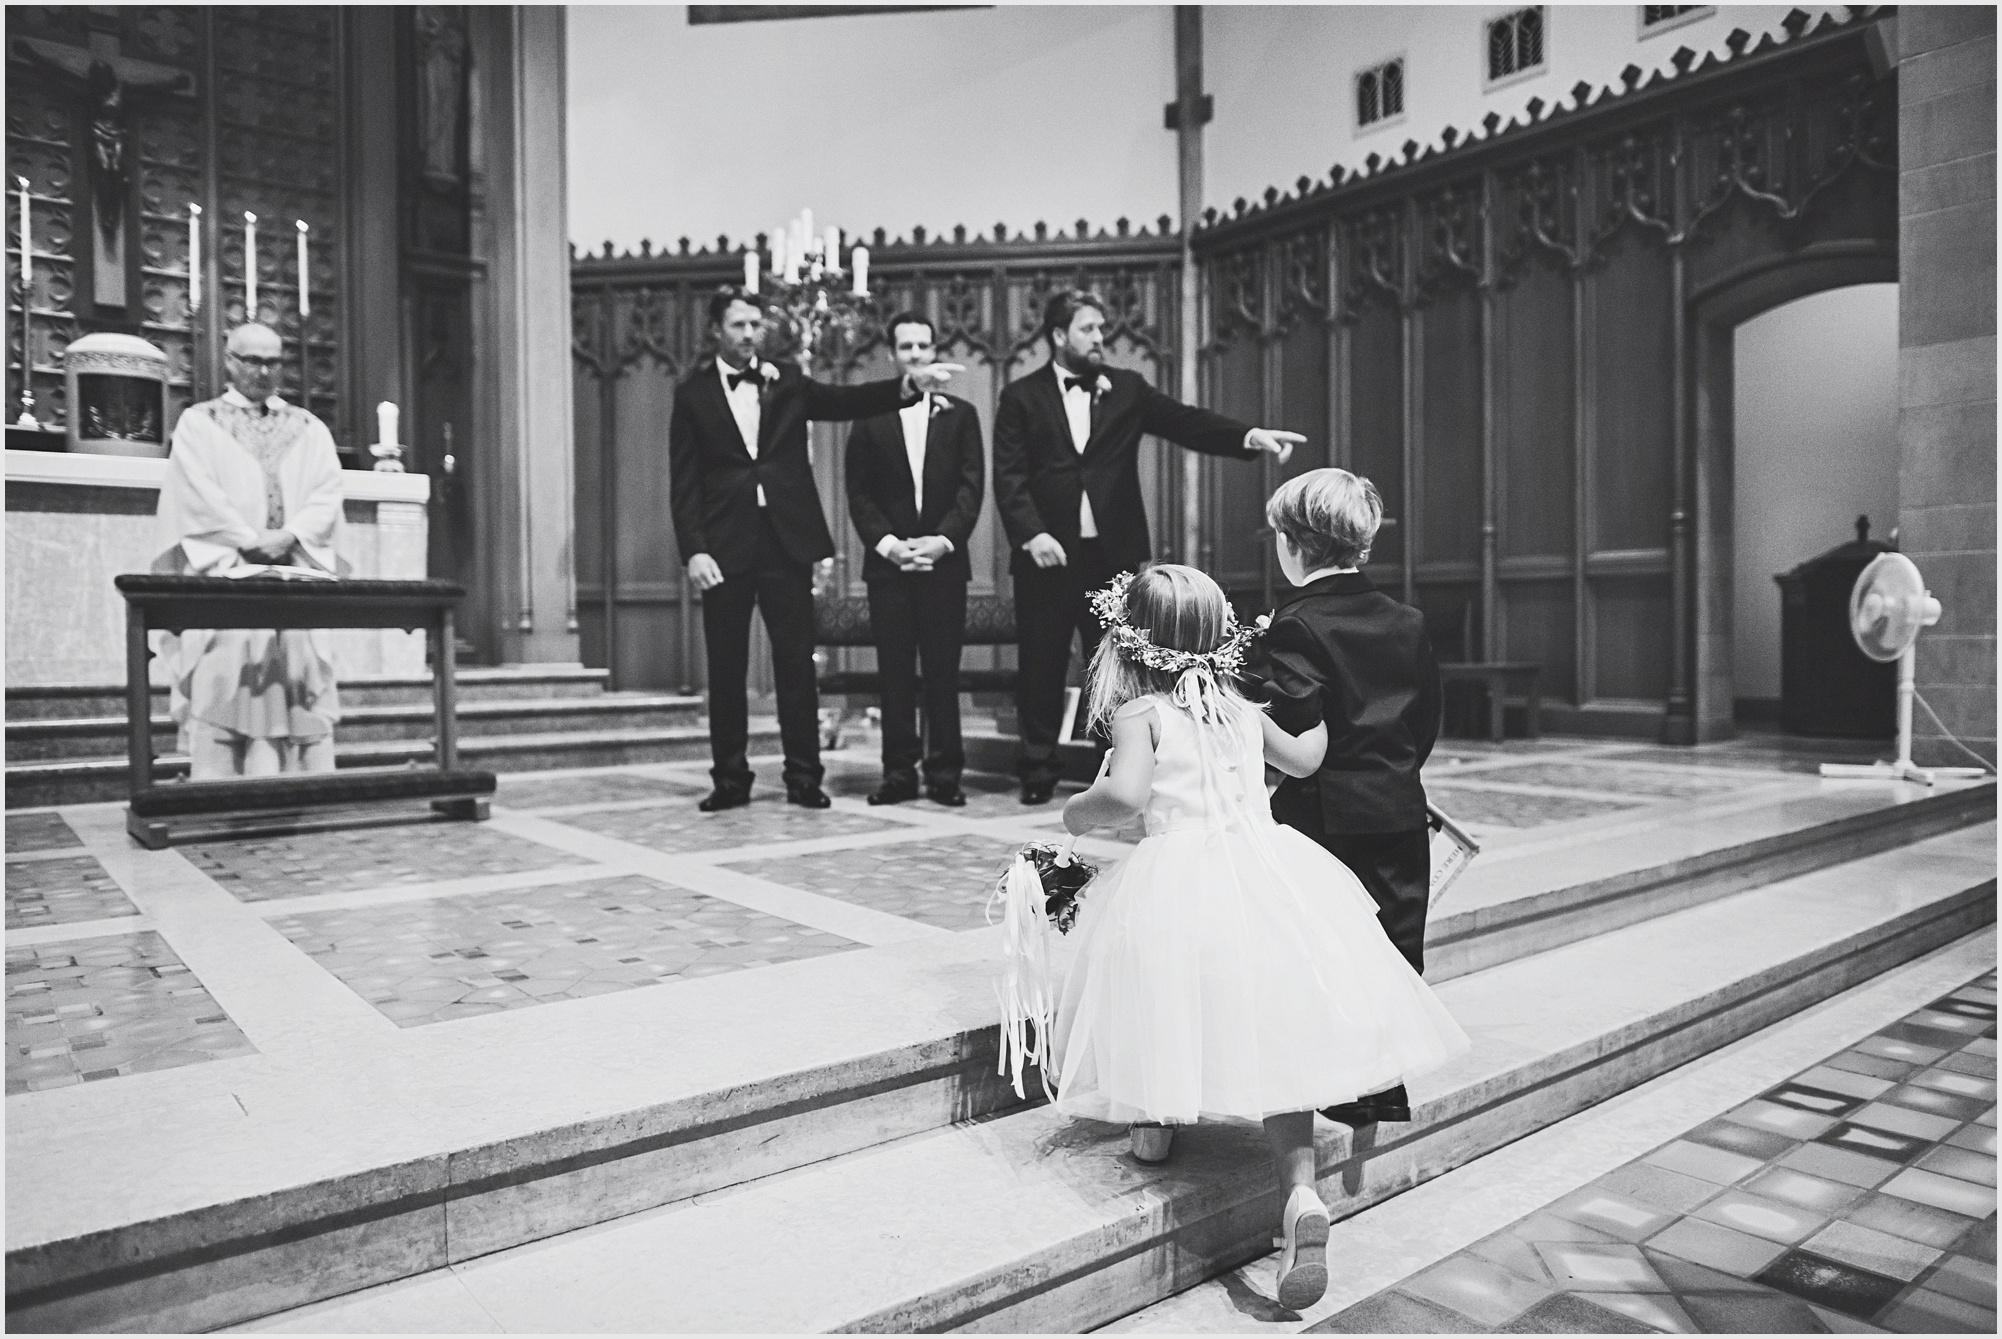 maura_david_james_j_hill_wedding_lucas_botz_photography_015.jpg